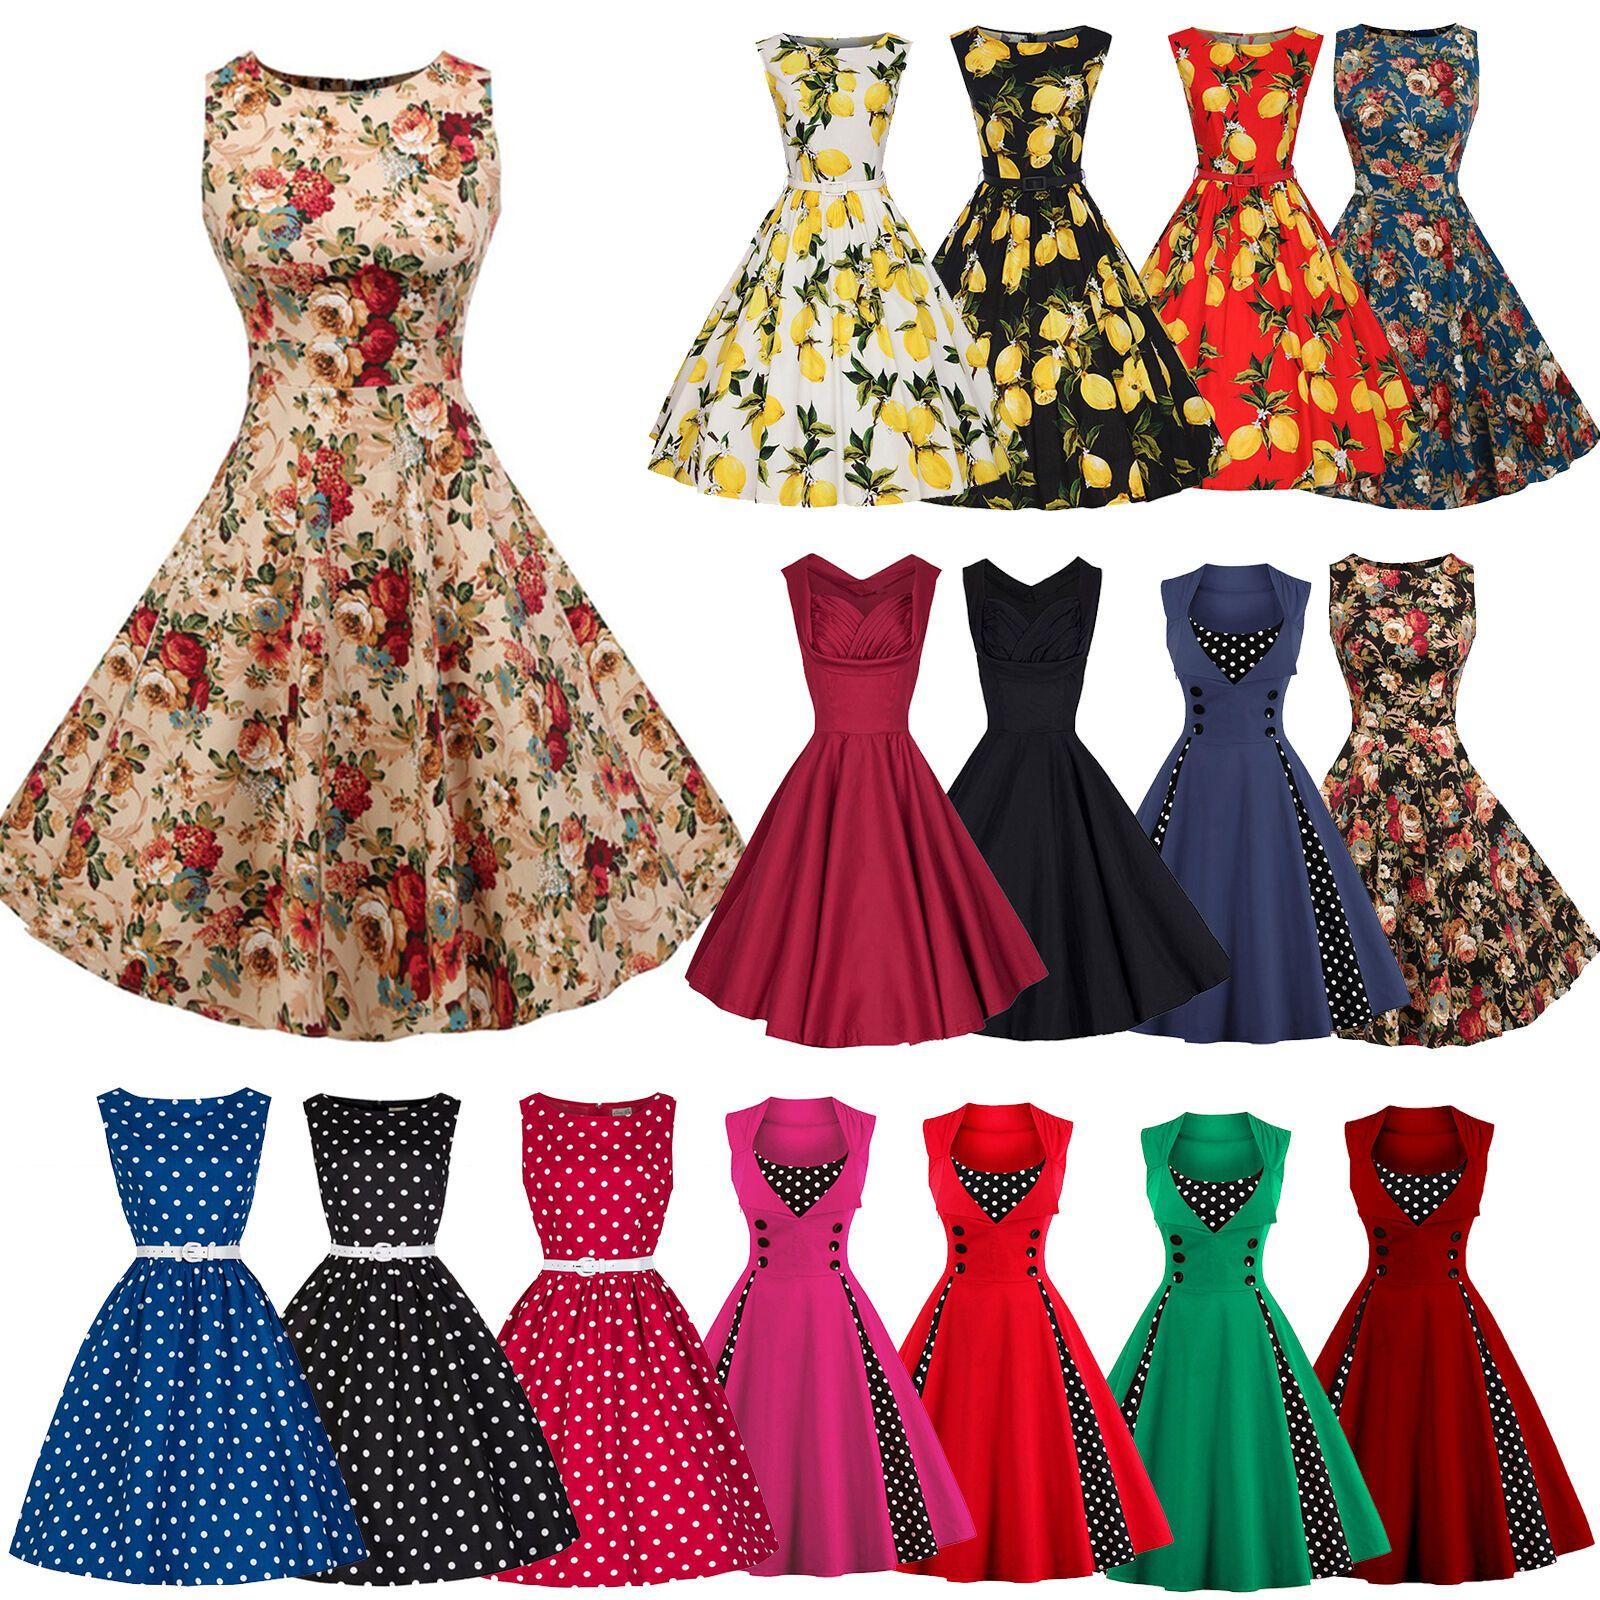 Womens Retro 50s Rockabilly Hepburn Swing Skater Dress Evening Party Dresses